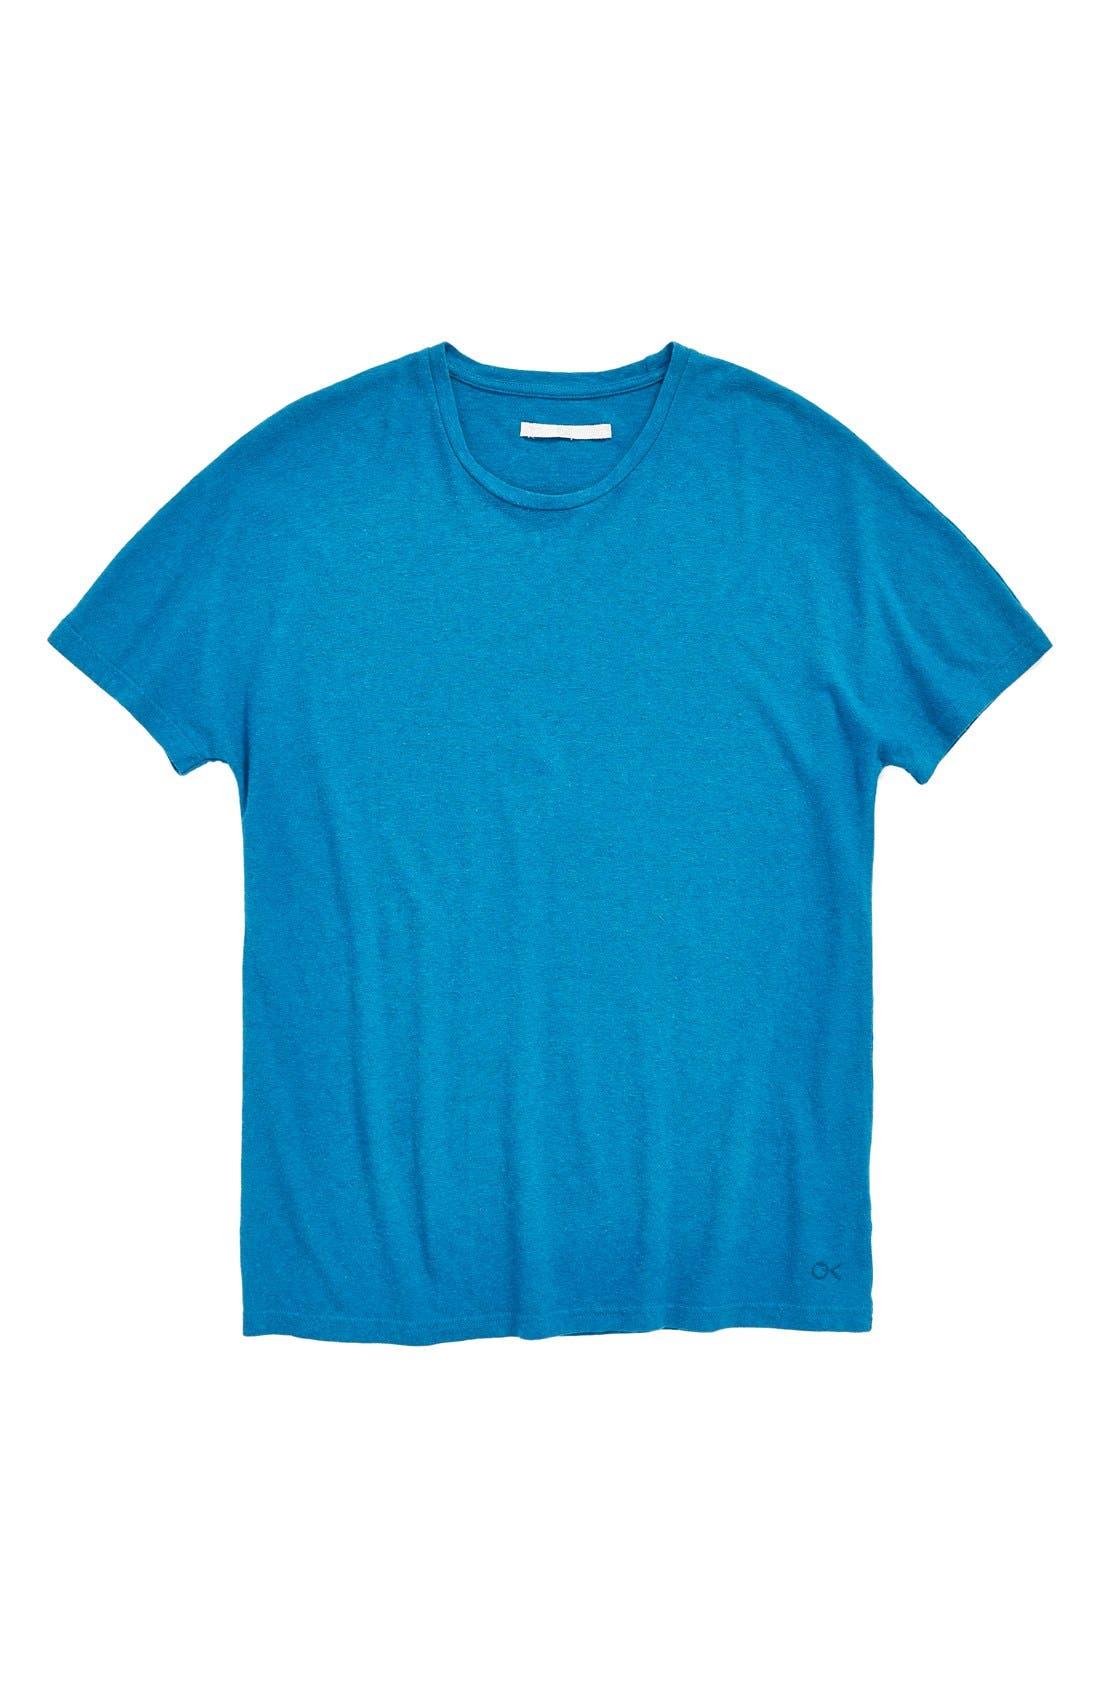 'Outerknown' Crewneck T-Shirt, Main, color, 420